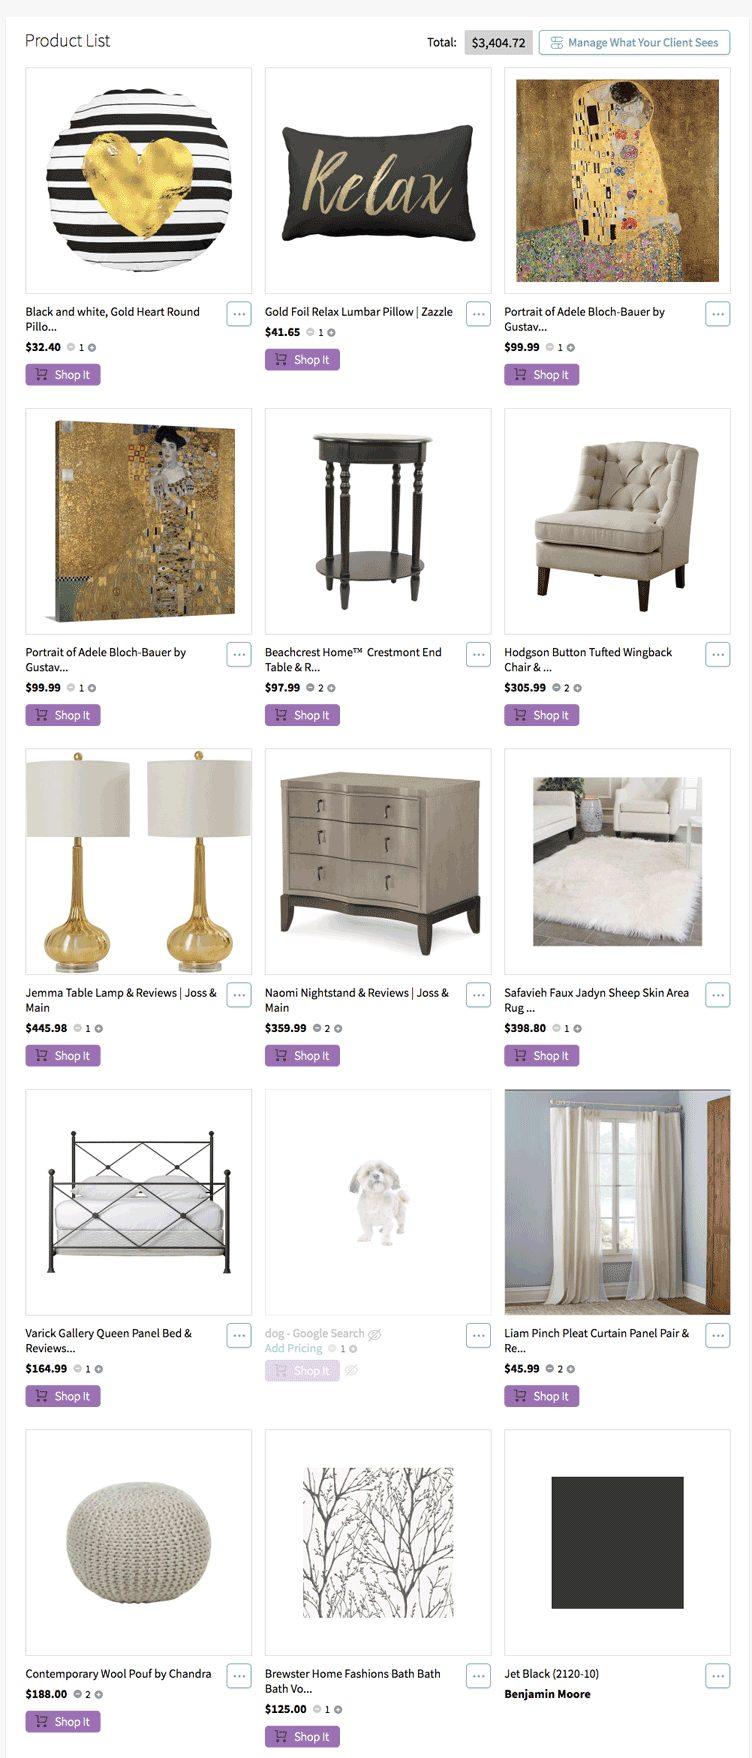 Gallery-I-DesignFiles---https___designfiles.co_boards_875